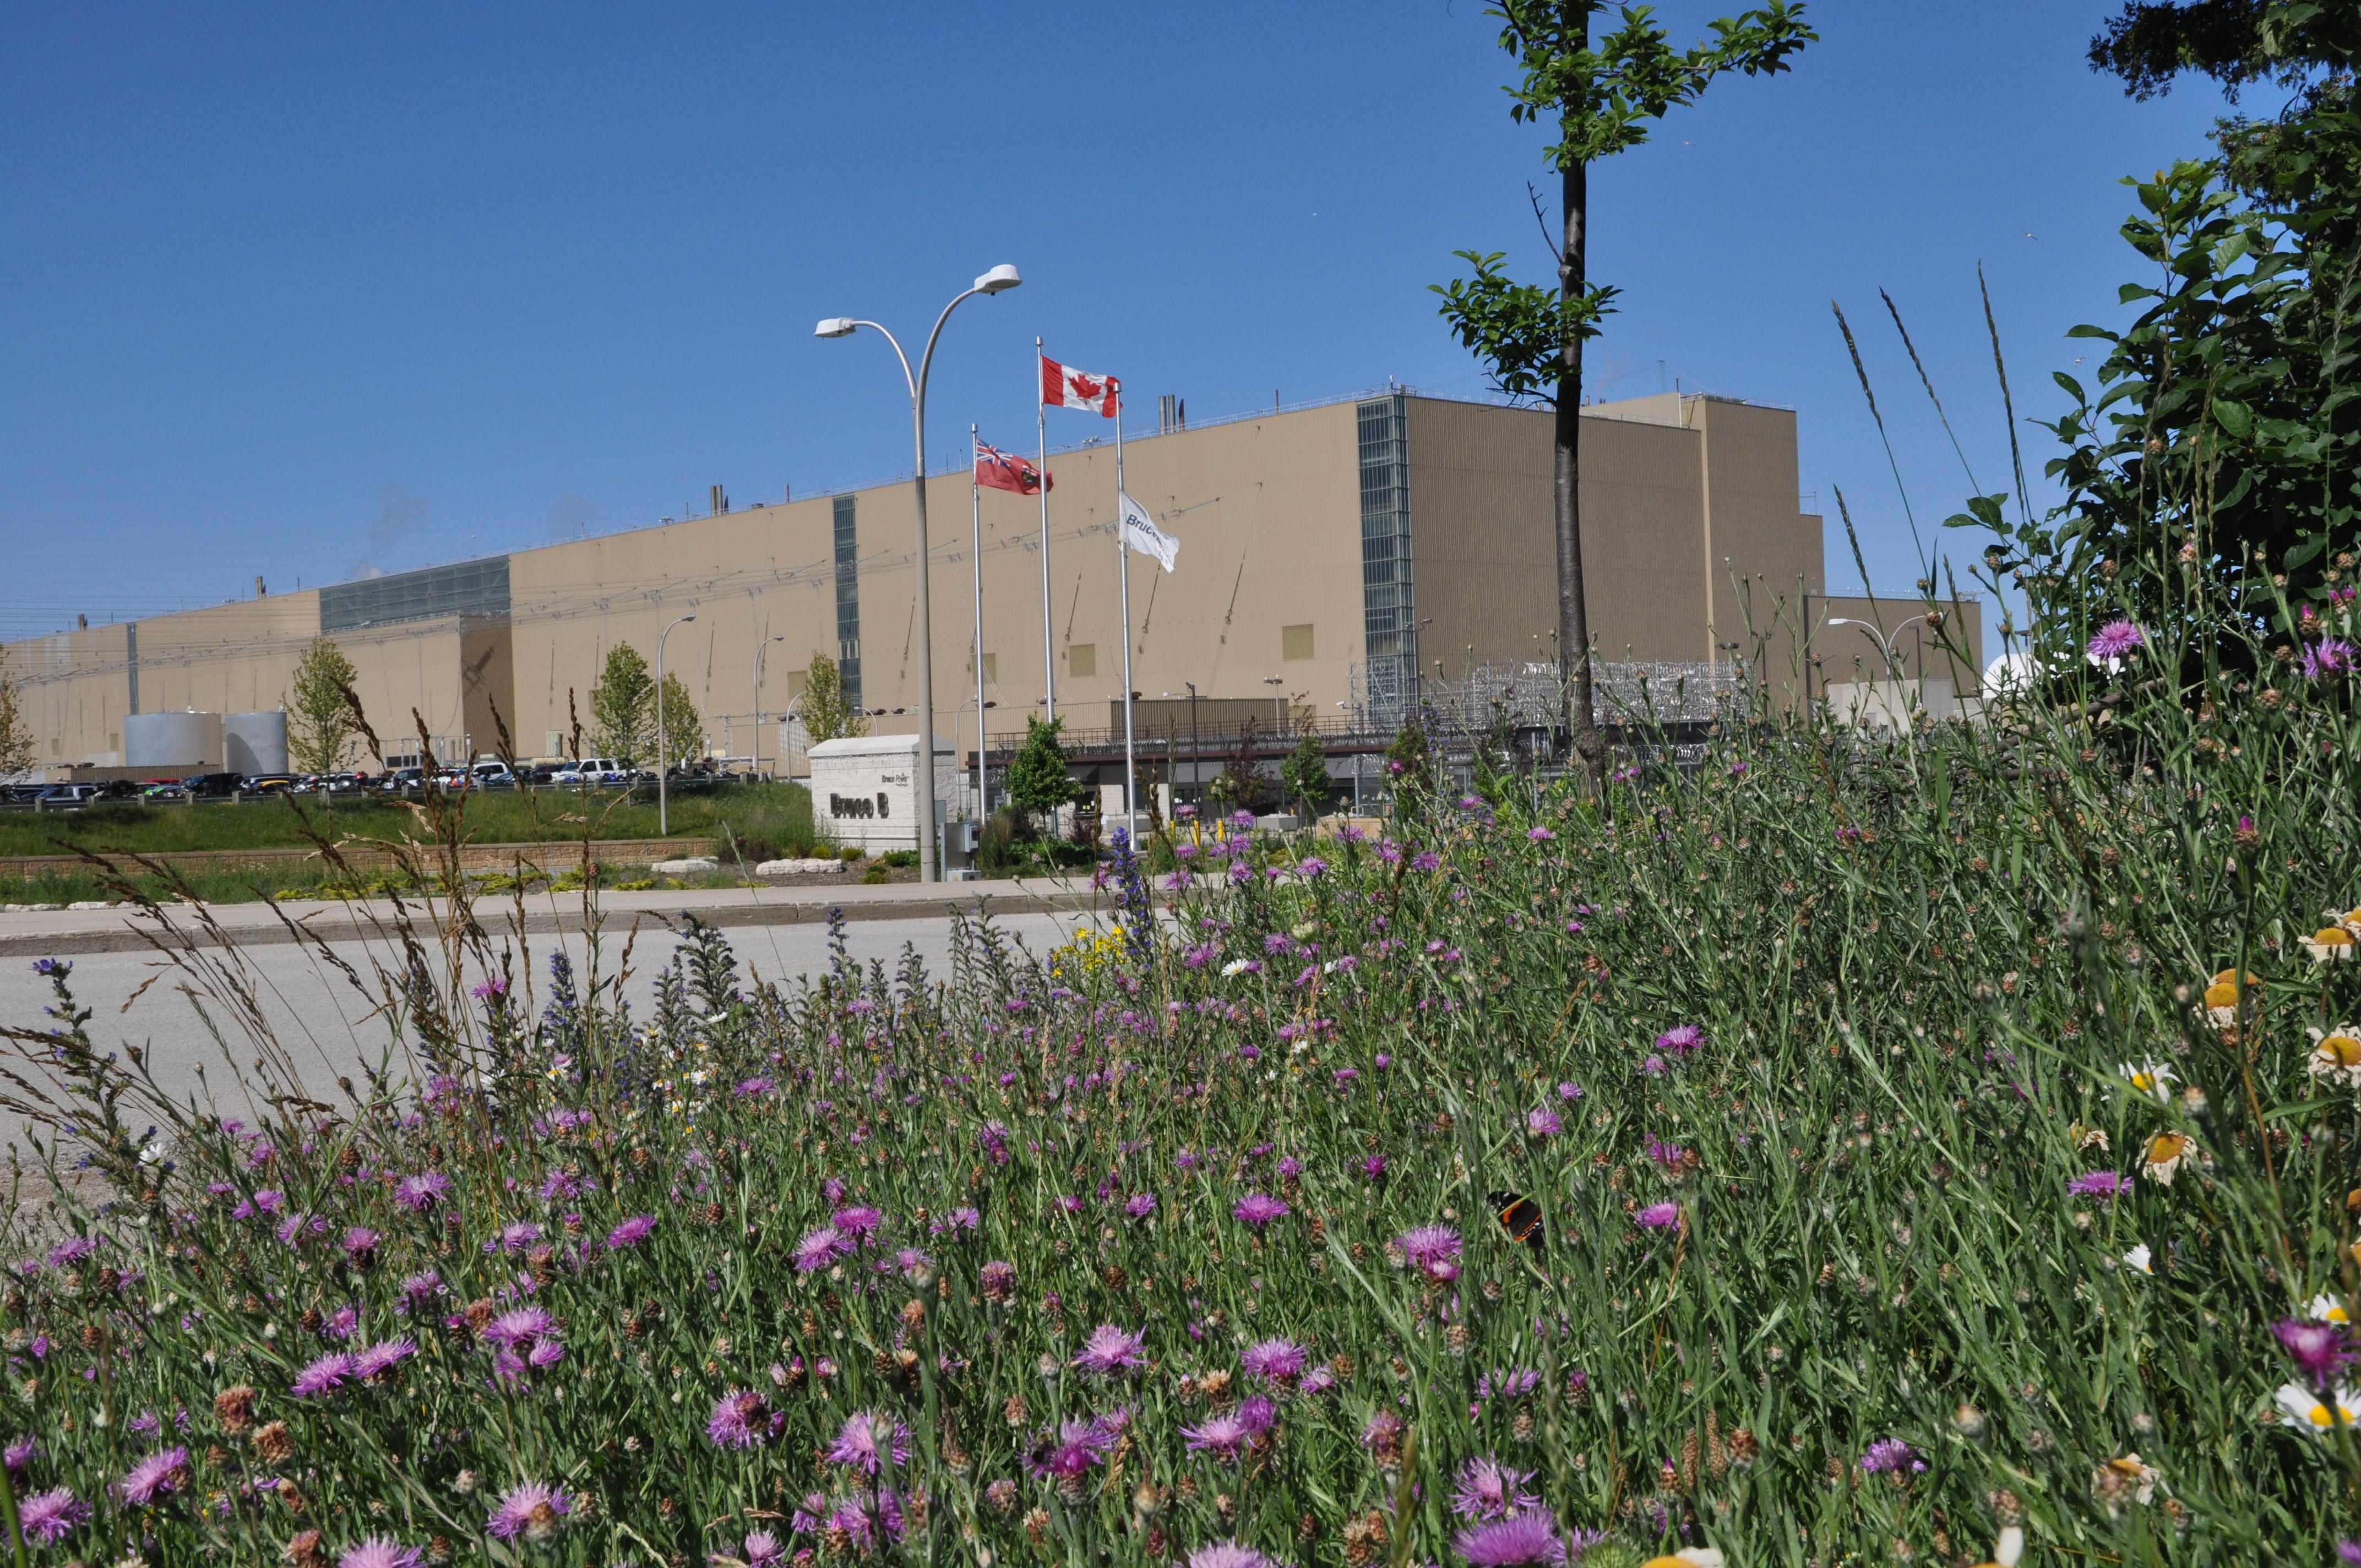 Bruce Power Generating Station B.